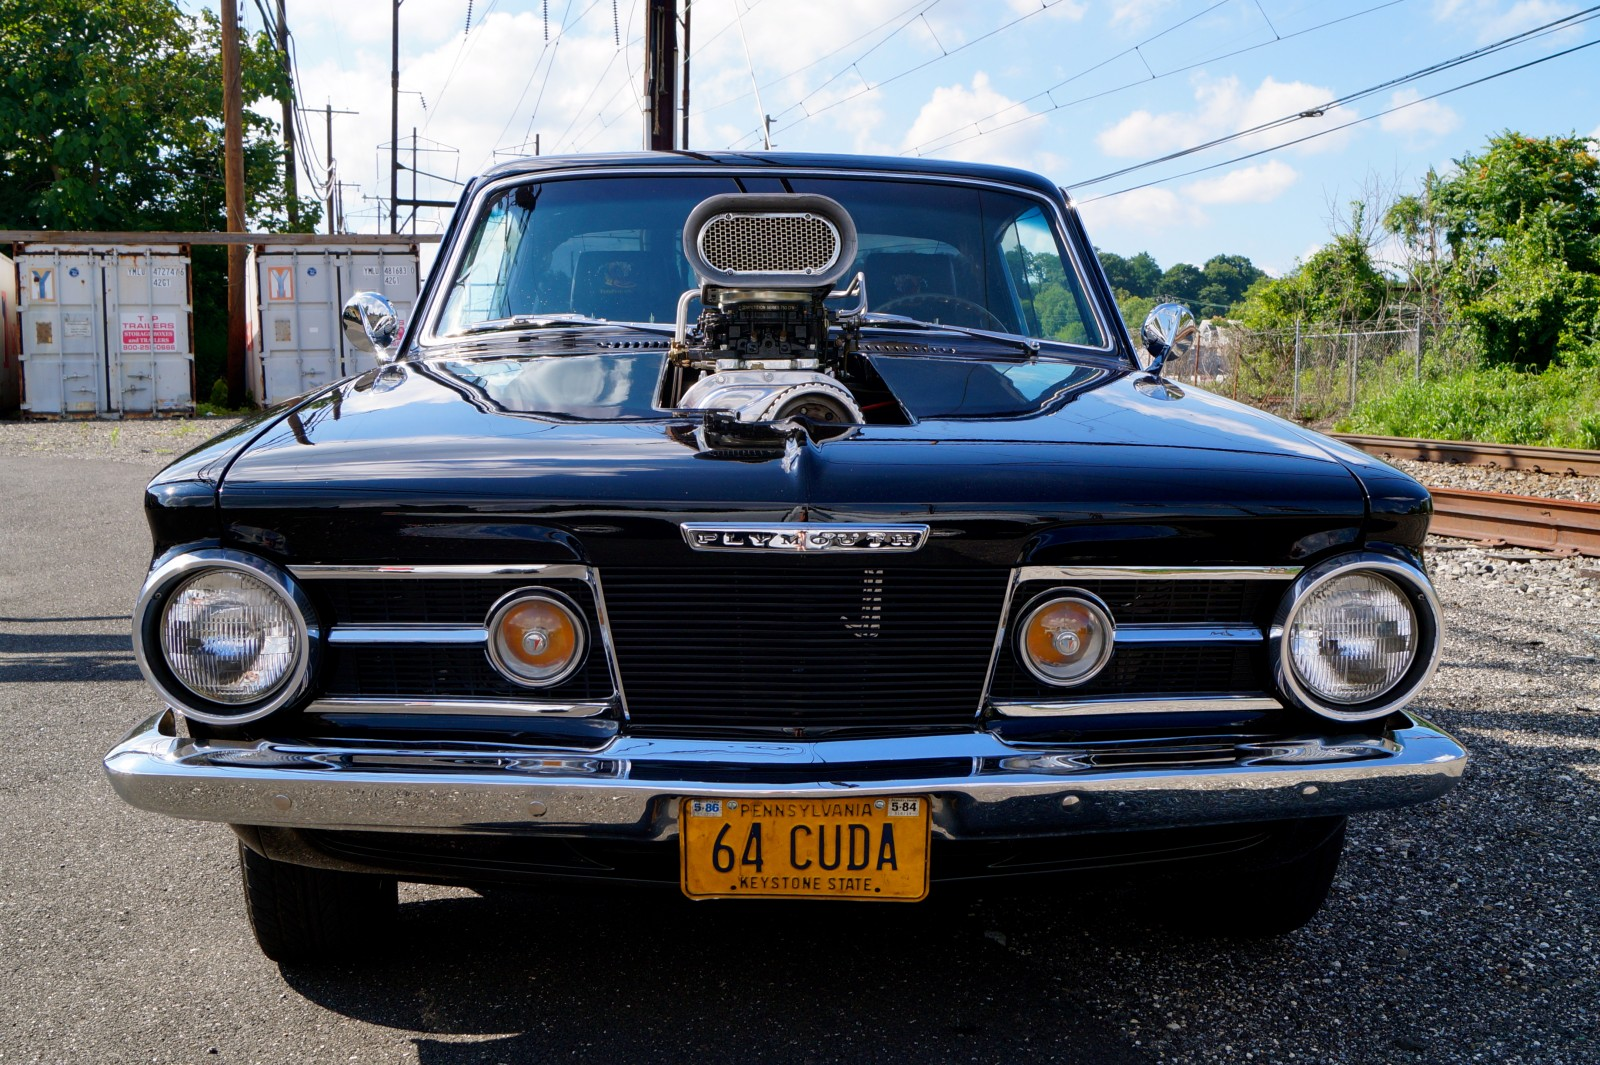 Mistaken Identity: 1965 Plymouth Barracuda